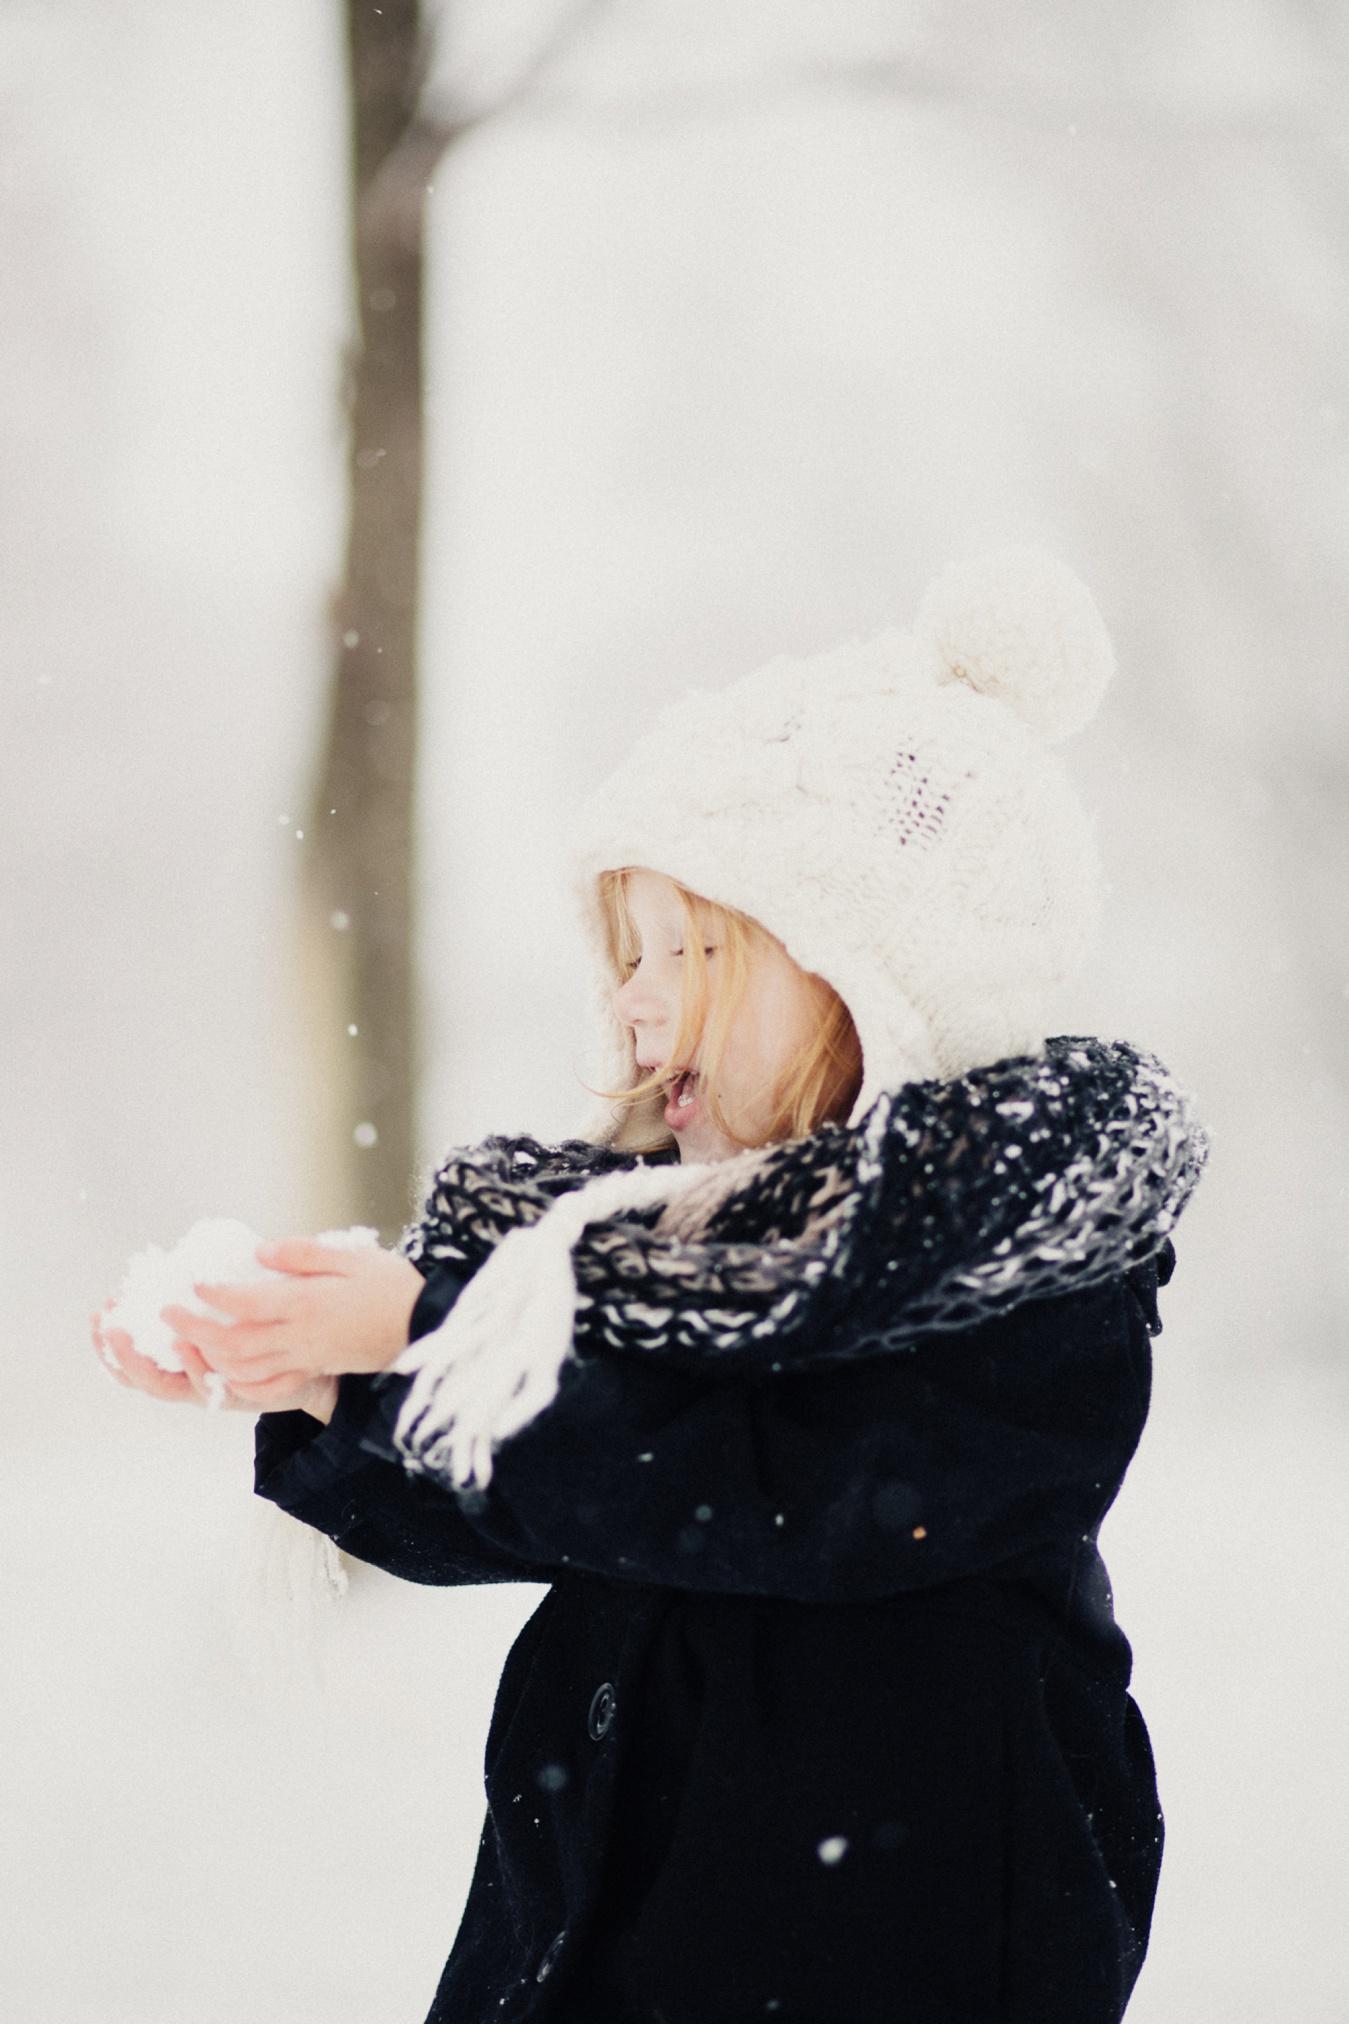 Zoe_Cohen_Snow_2015_web-54.jpg